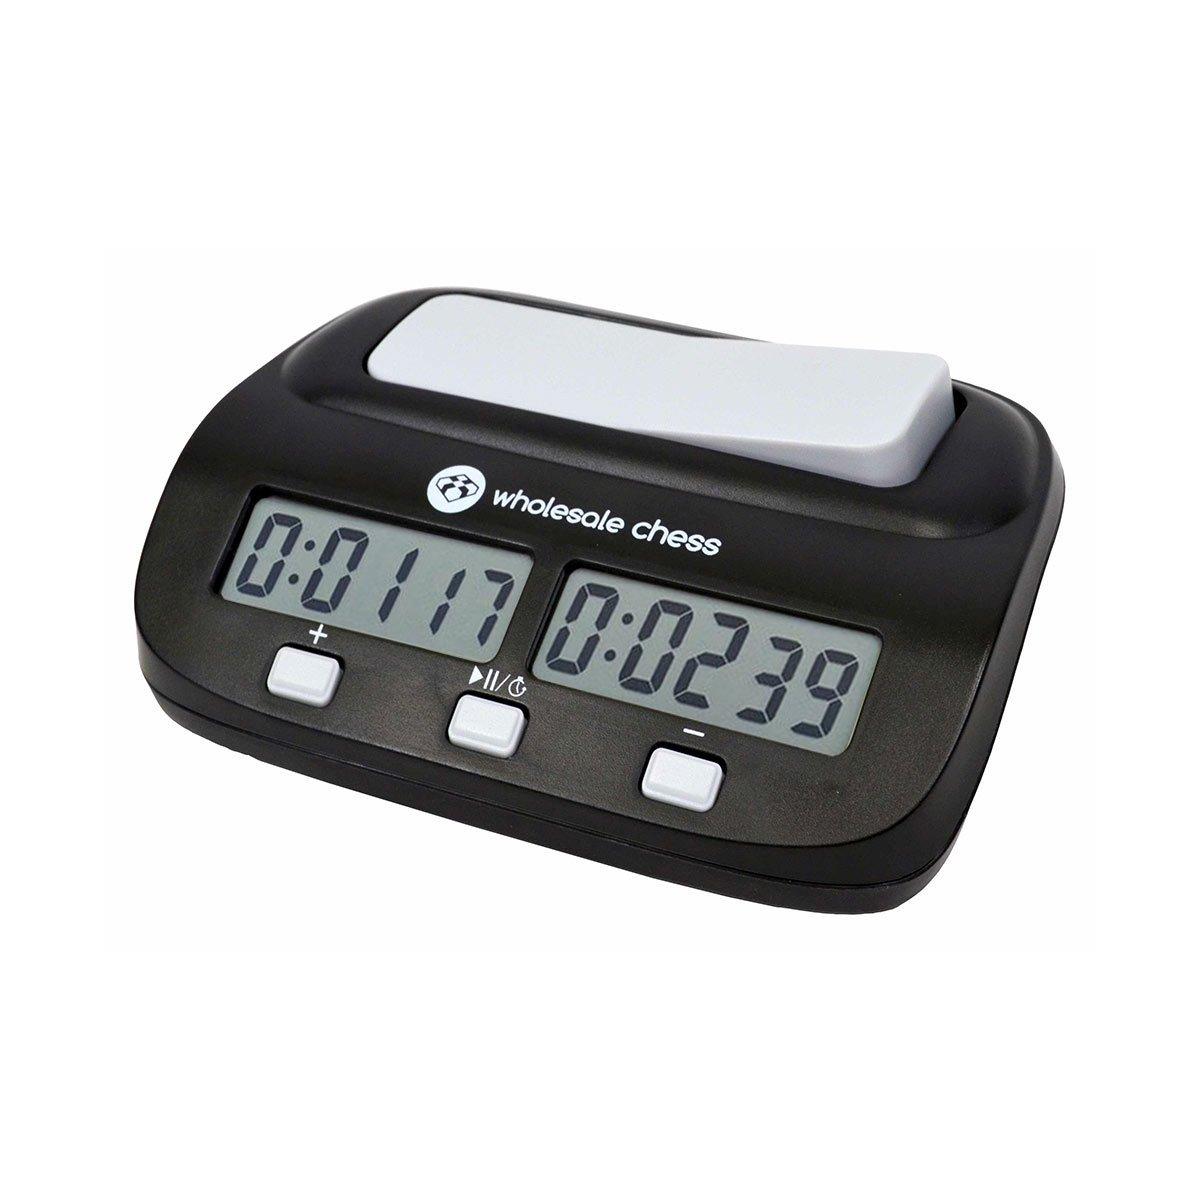 Wholesale Chess Basic Digital Chess Clock & Game Timer